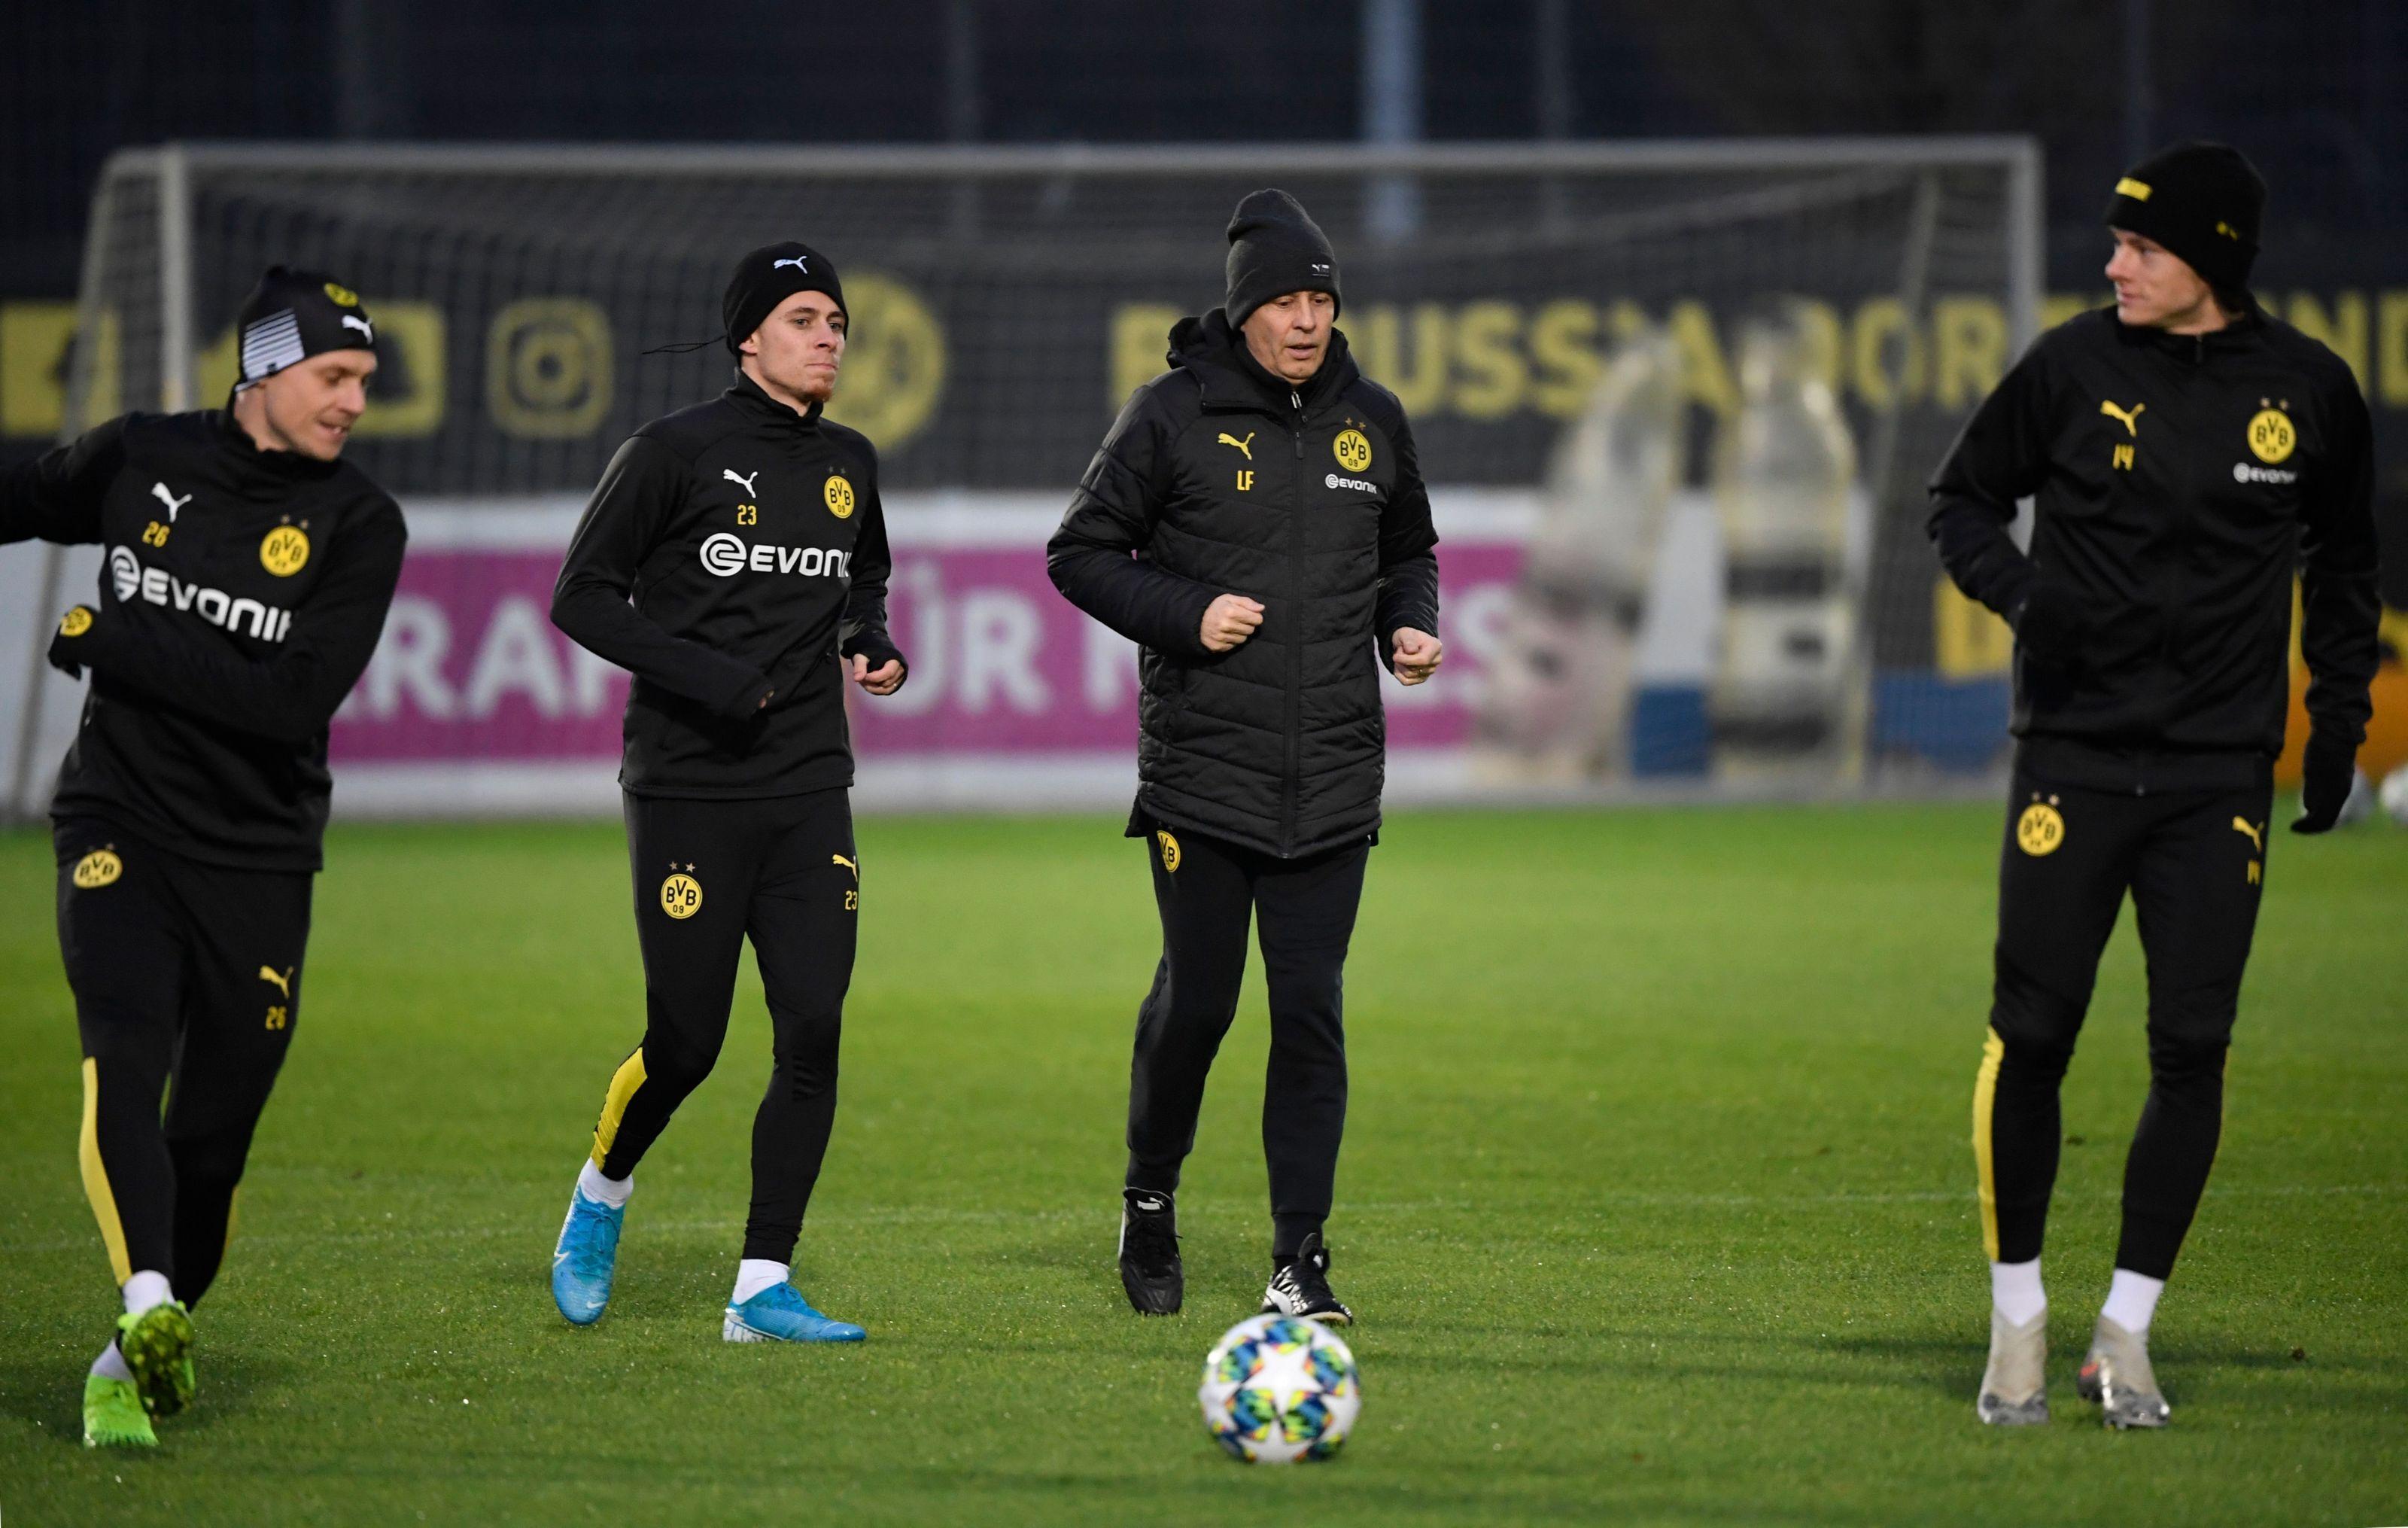 How to watch Borussia Dortmund vs Slavia Praha: Live Stream, TV Channel for Champions League clash